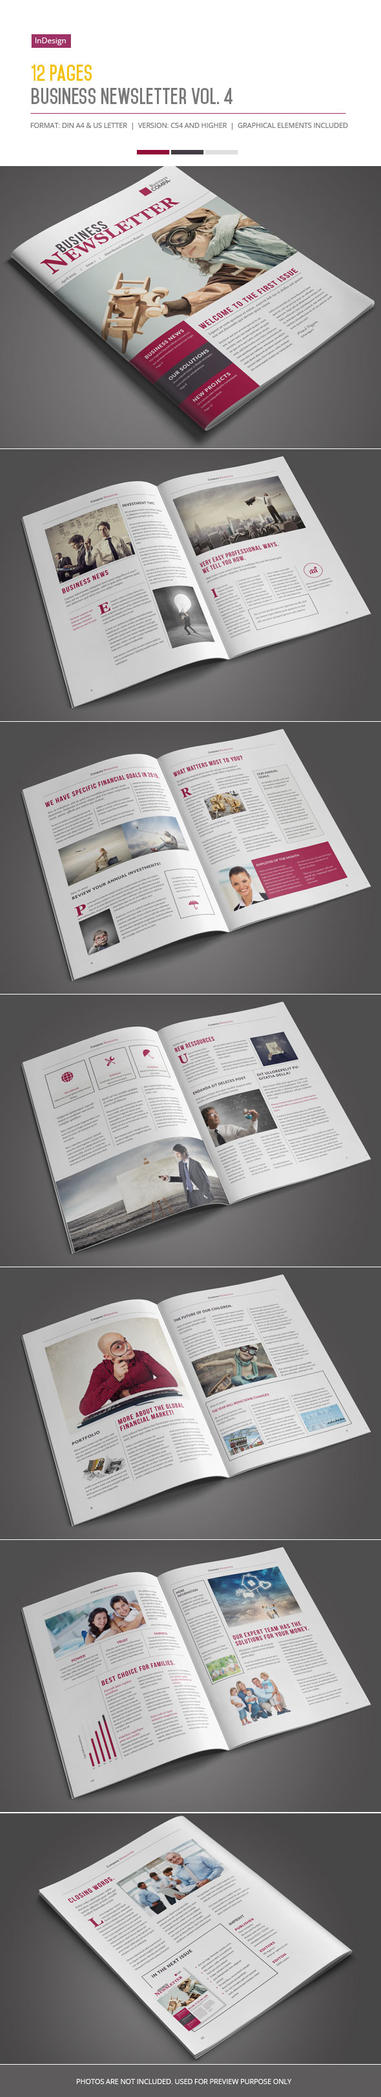 Business Newsletter Vol. 4 by imagearea